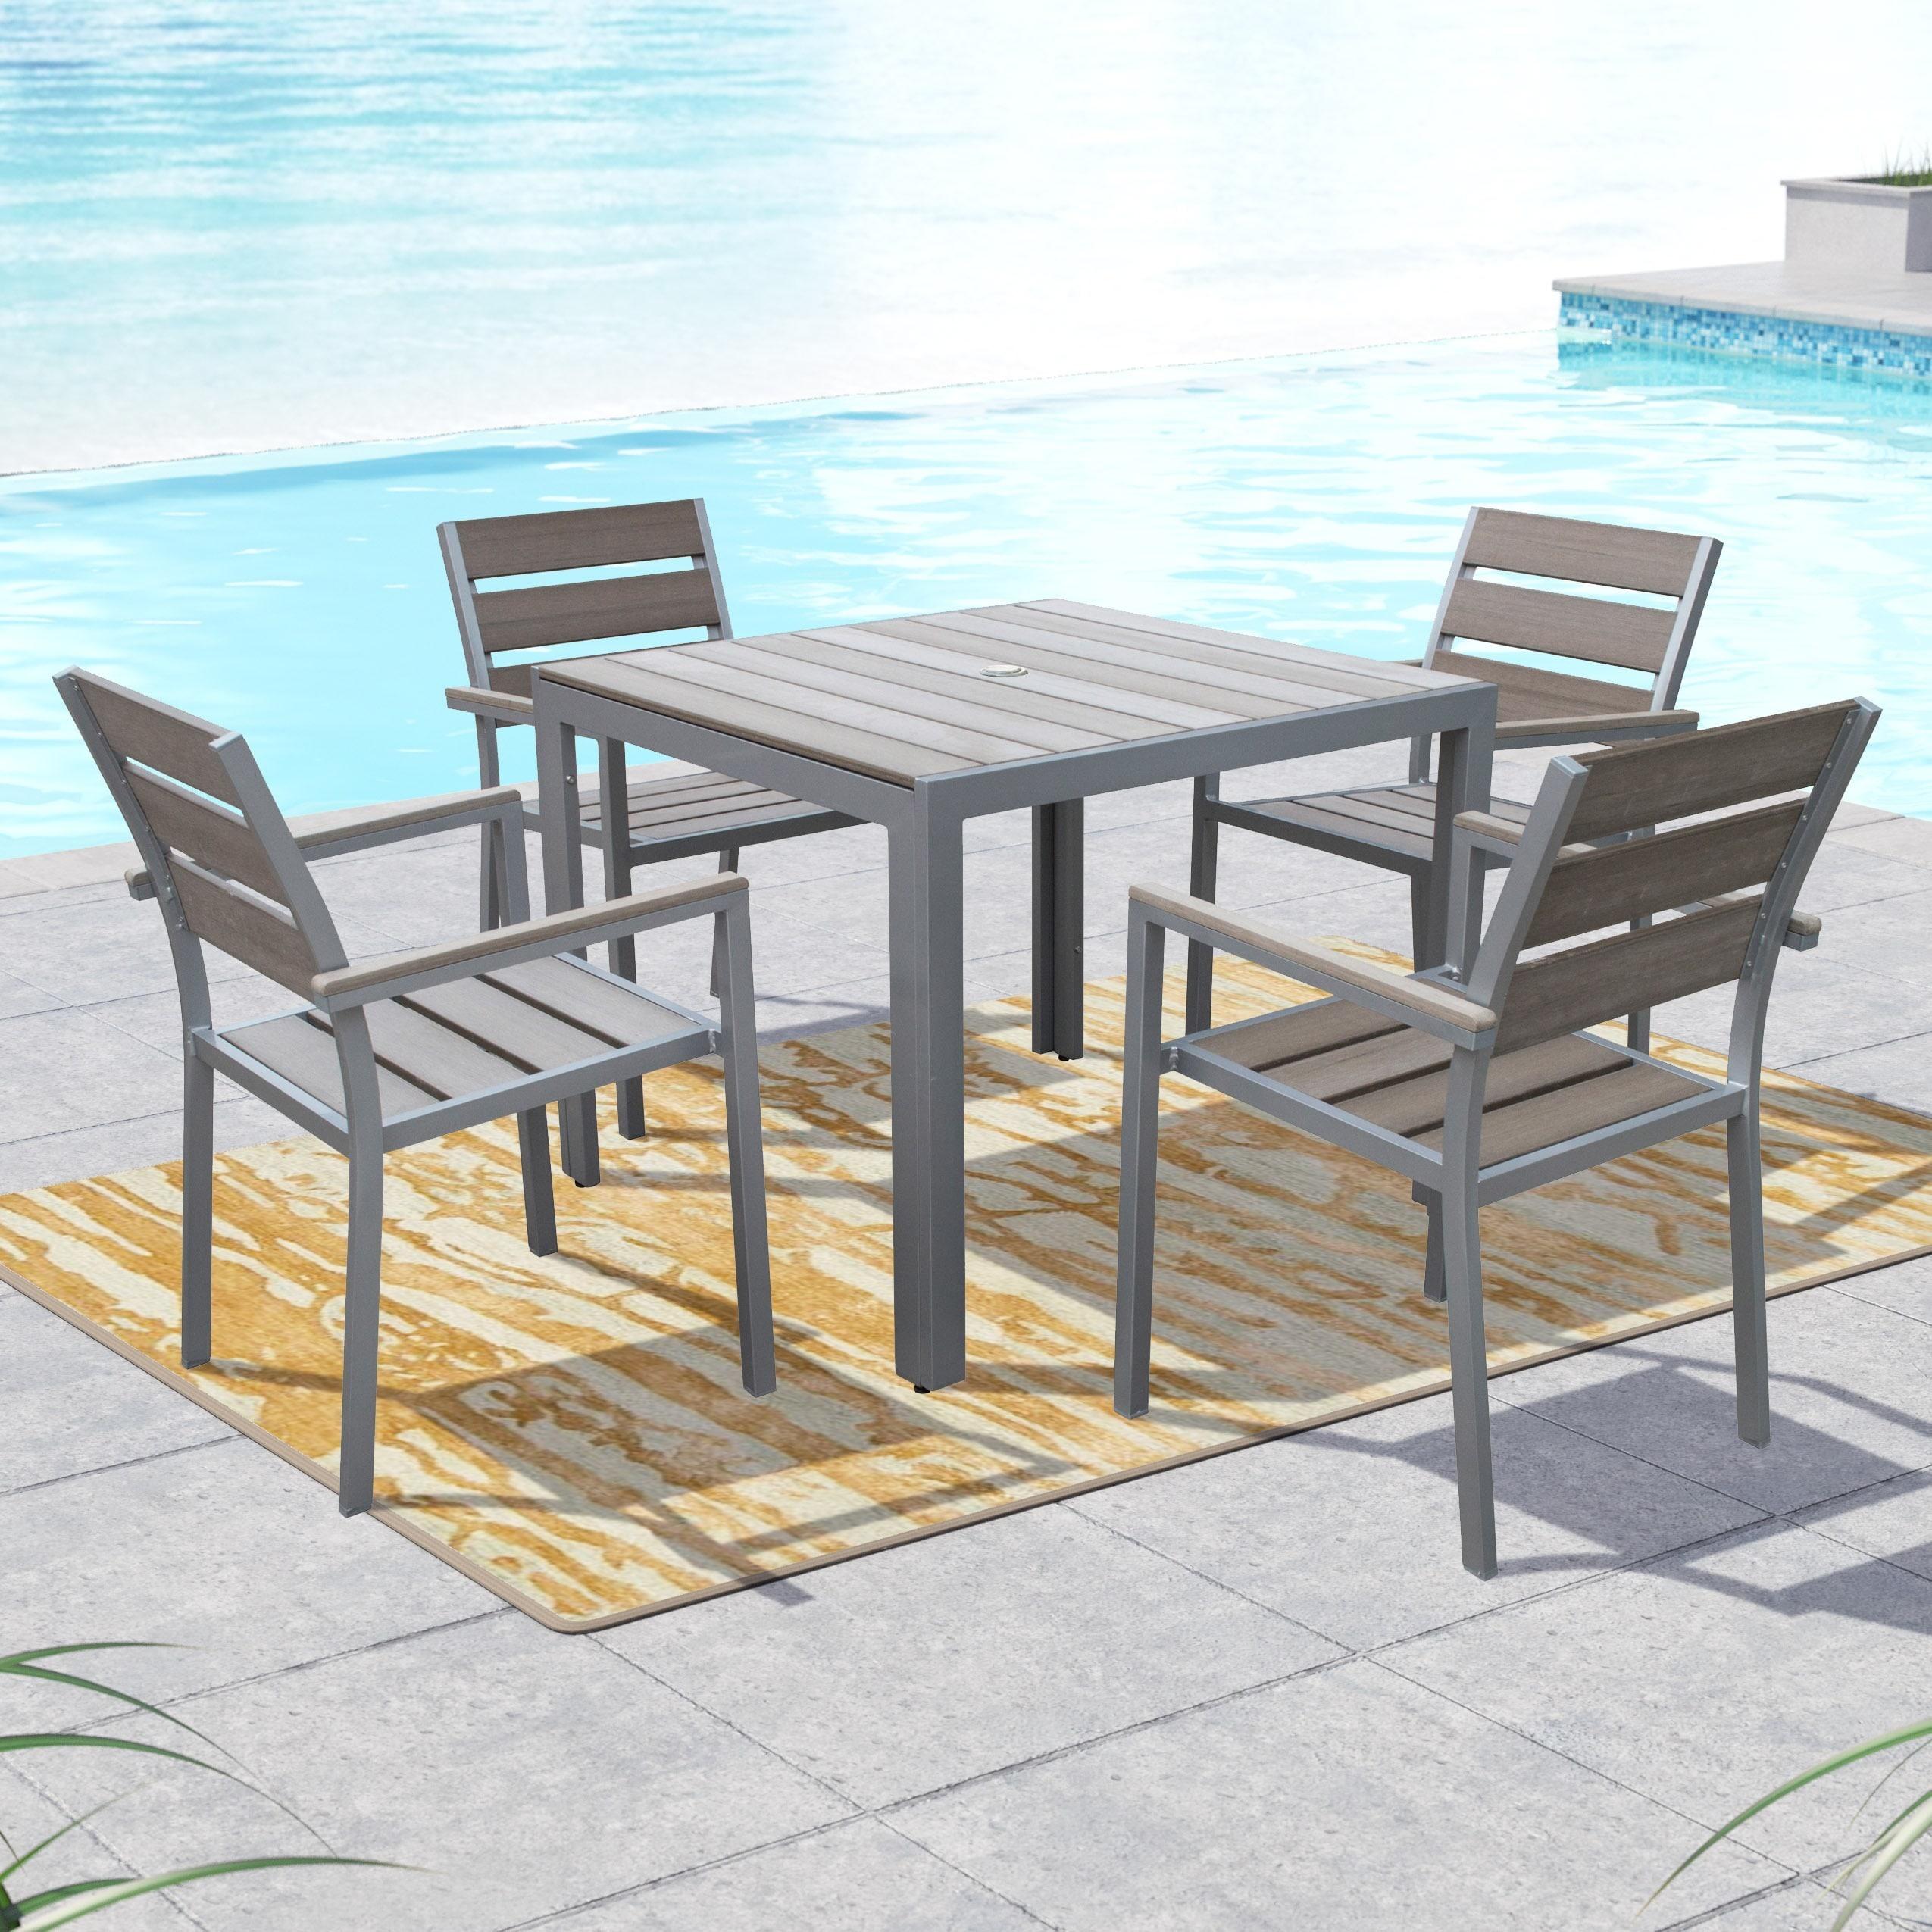 New 5 Piece Patio Dining Set